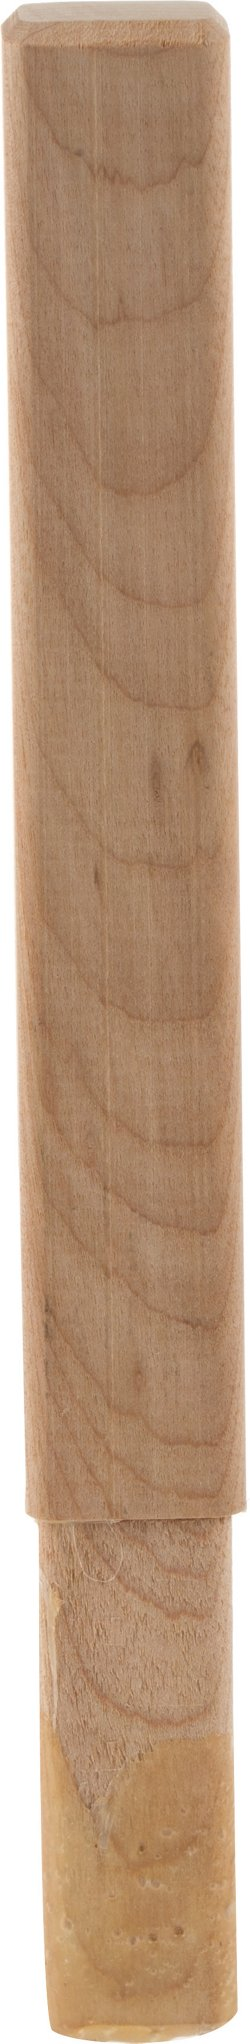 Proguard Wooden Hockey Stick End